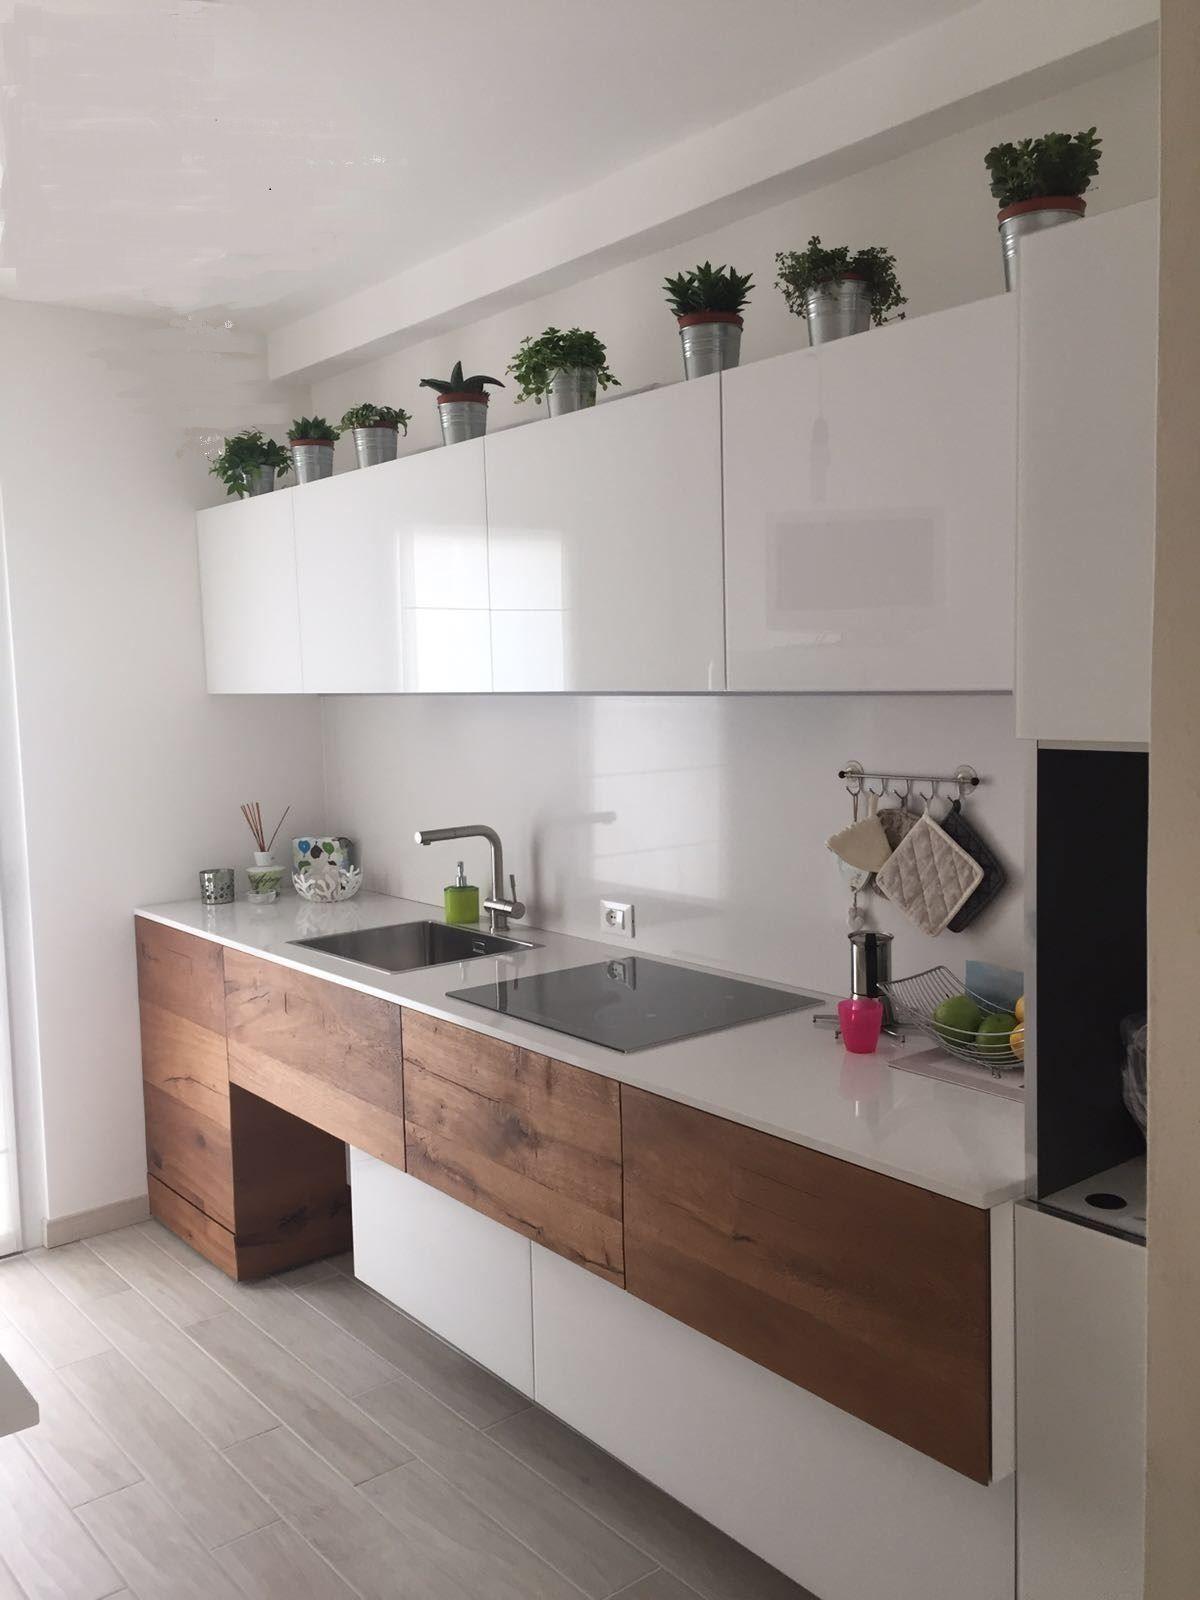 100 idee di cucine moderne con elementi in legno | Eldhús | Kitchen ...